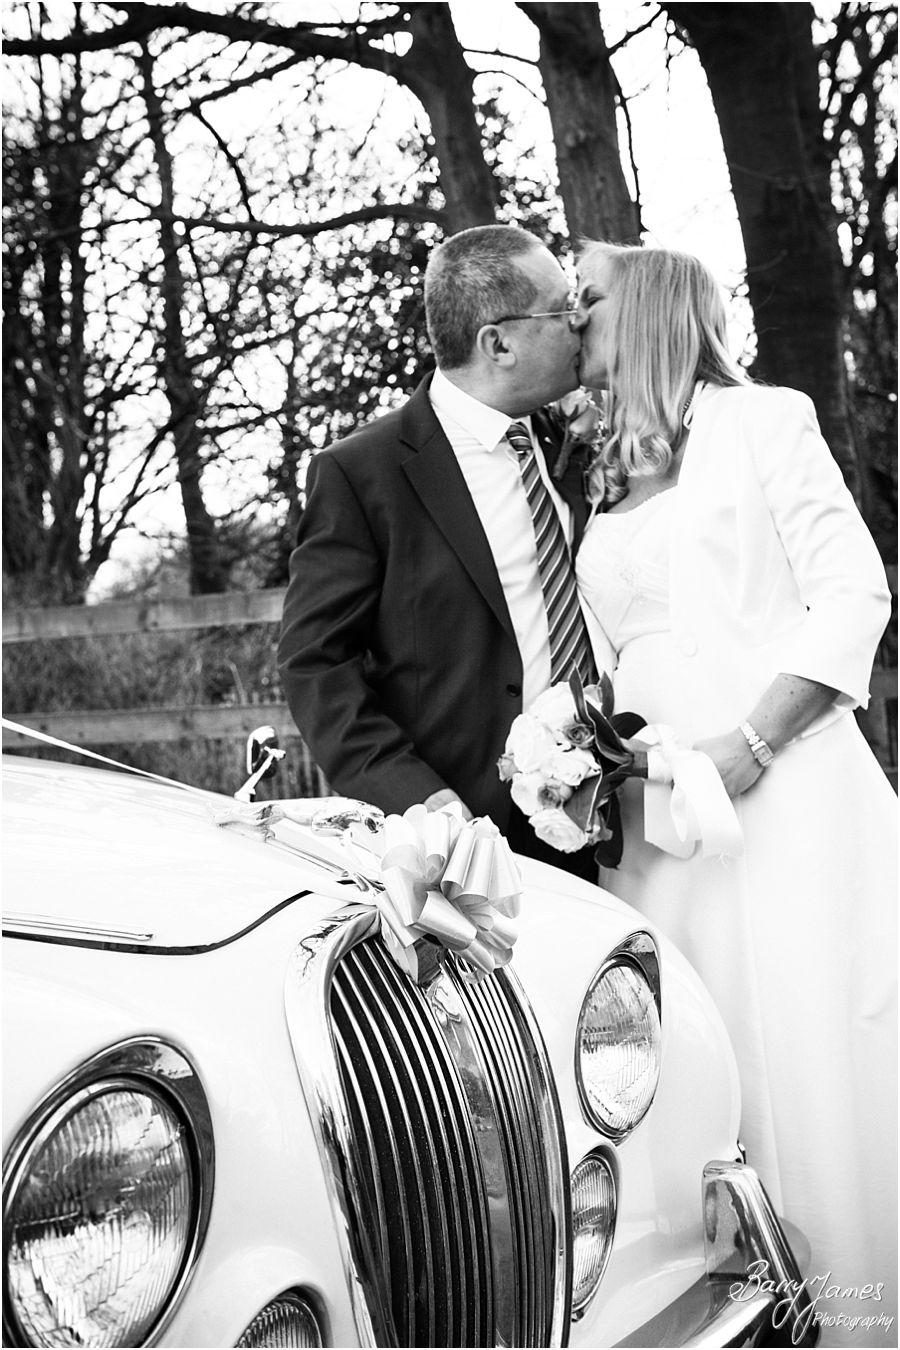 Creative modern wedding photos at Walsall Arboretum in Walsall by Award Winning Wedding Photographer Barry James